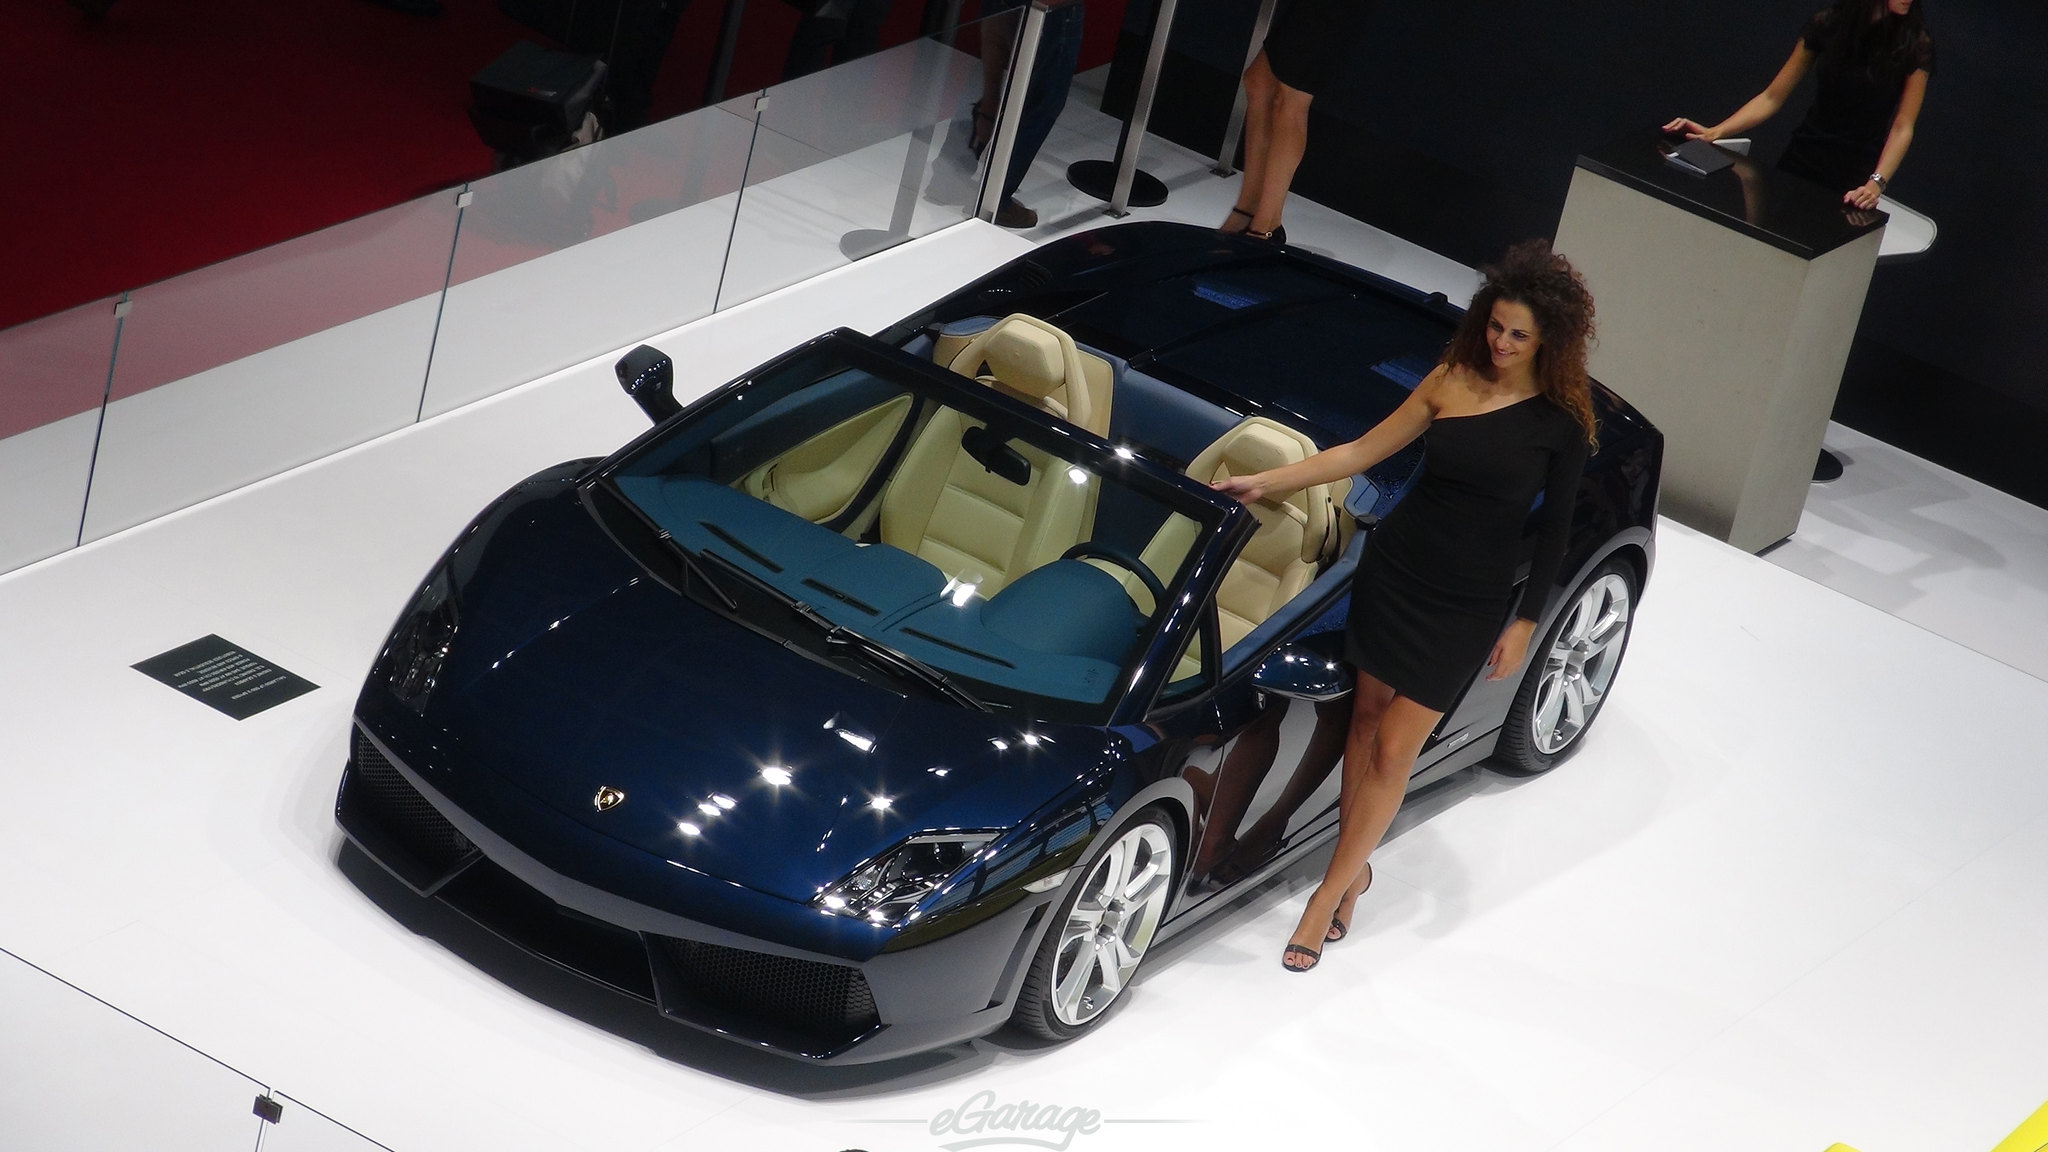 8034744425 32389a8a76 k 2012 Paris Motor Show